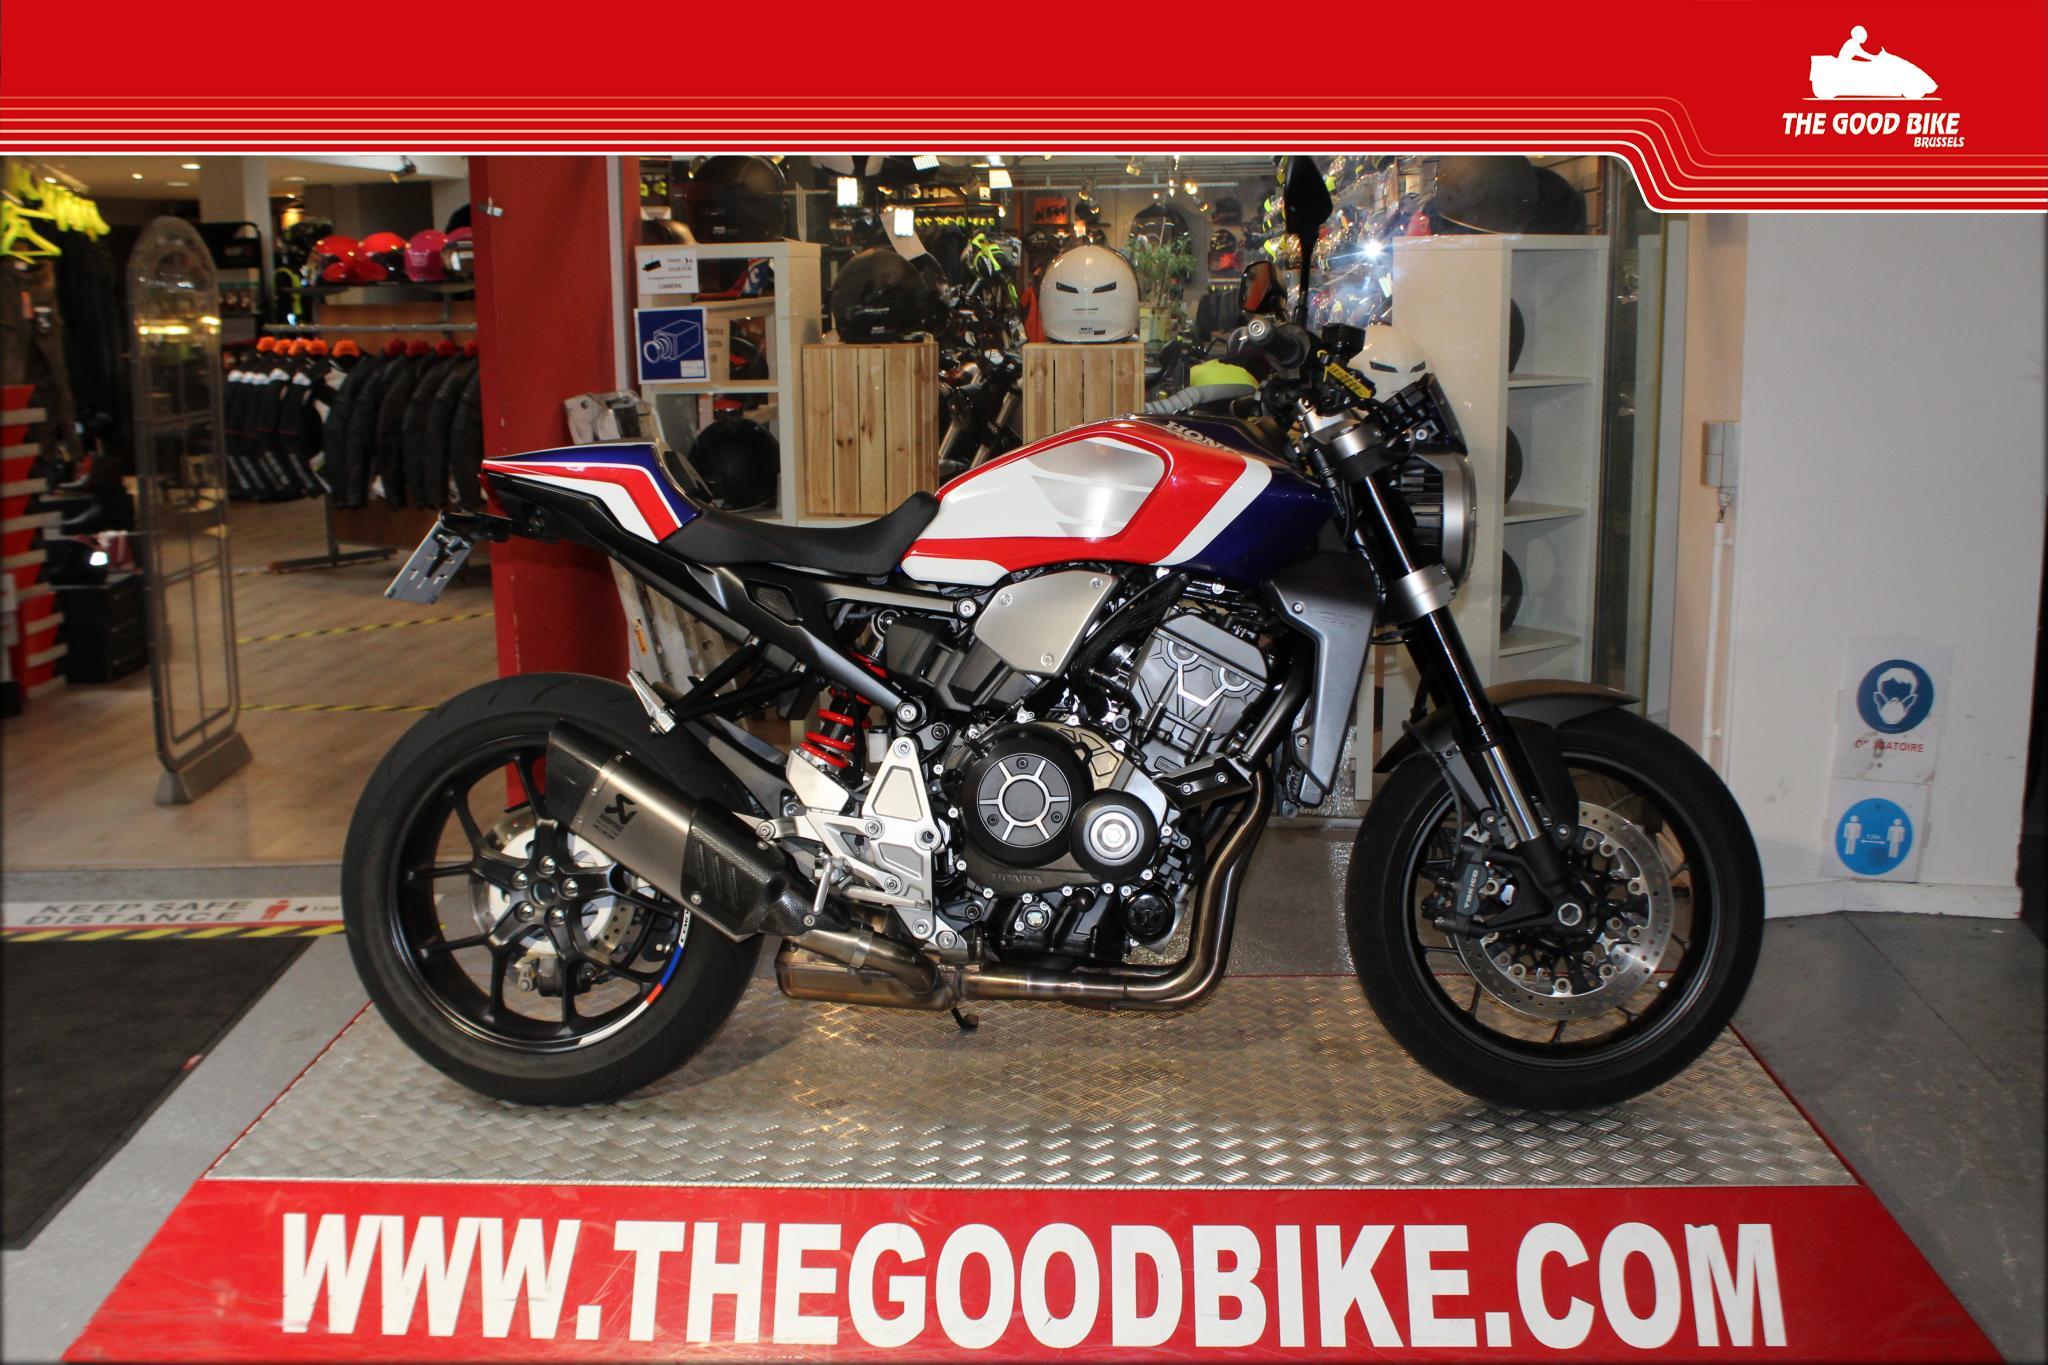 Honda CB1000RA SpecialEditionN°17/40 2019 hrc - All road